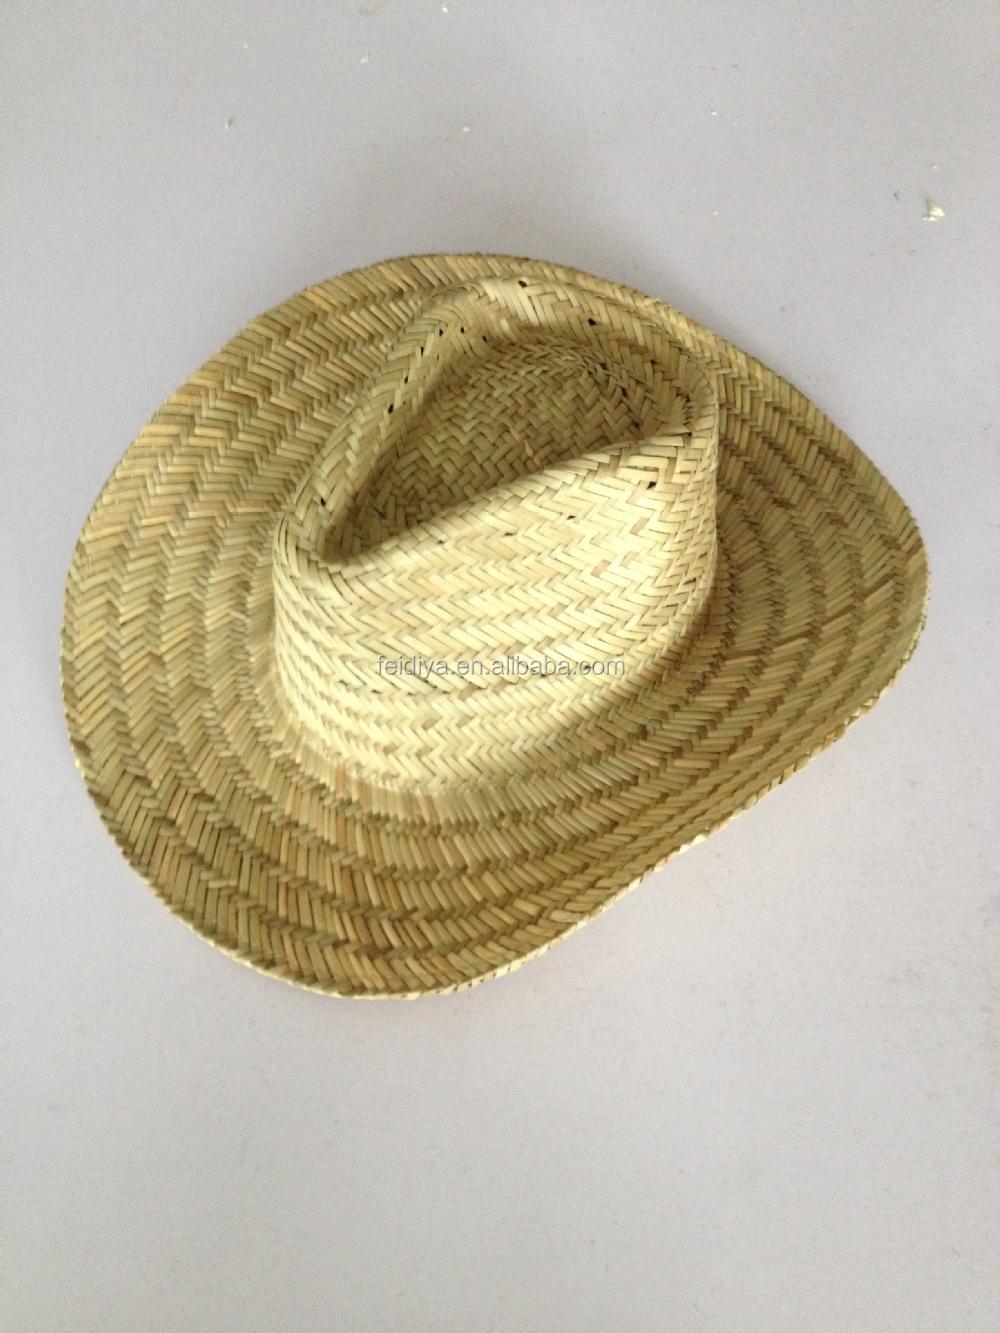 69003f2dbd7 Wholesales Rush straw hat for men